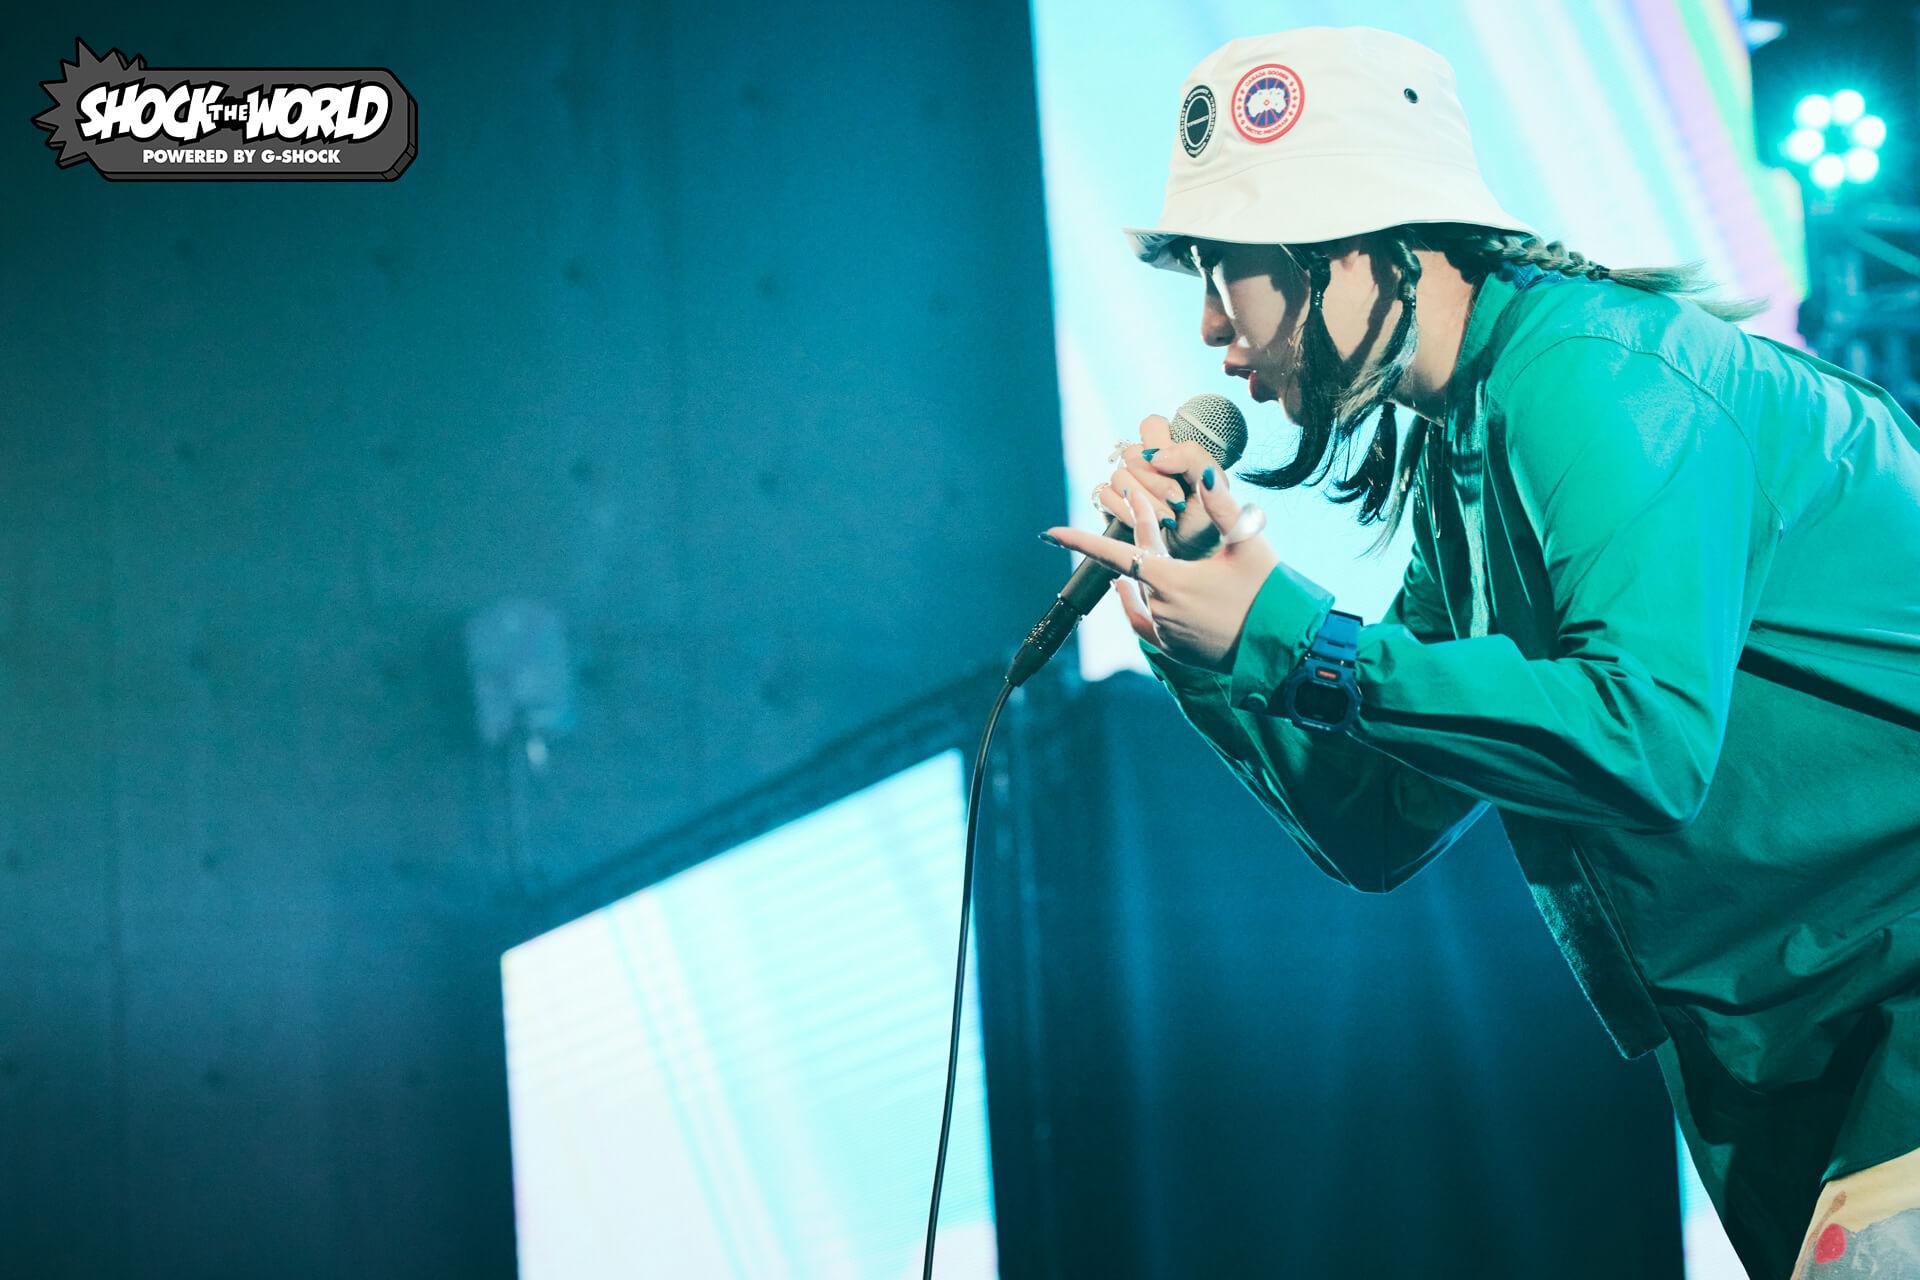 G-SHOCK『SHOCK THE WORLD』第6弾で80KIDZ、あっこゴリラ、YonYonのトーク&ライブセッションが実現! music210804_shocktheworld_1